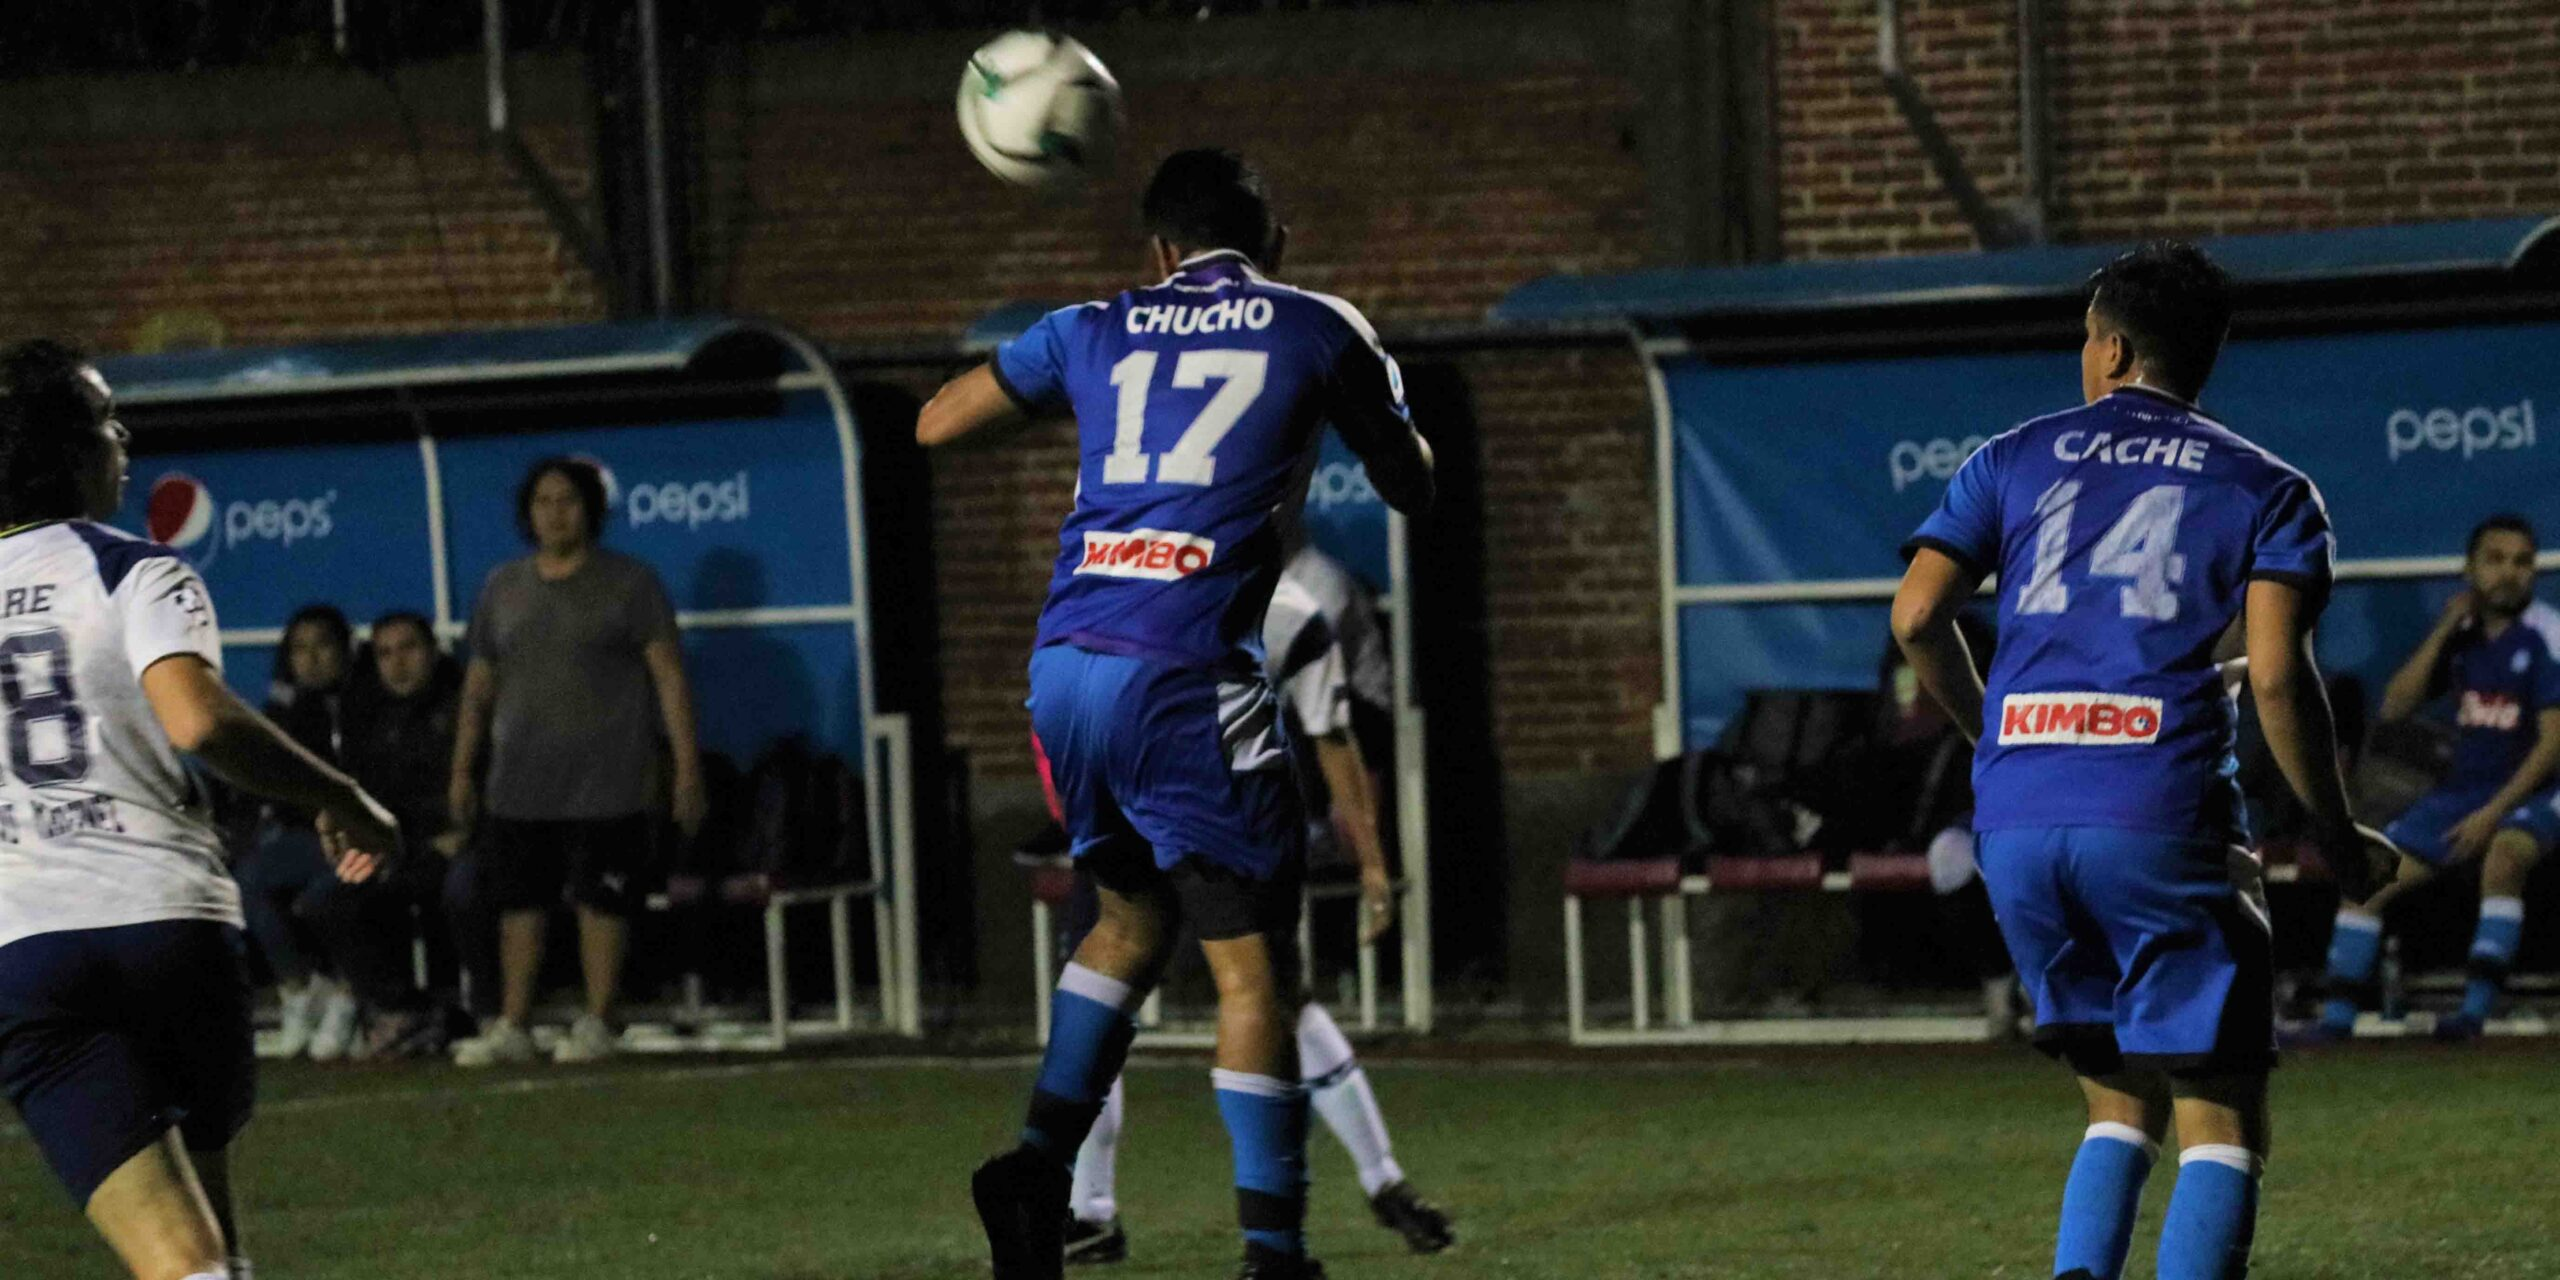 Regresa Torneo Empresarial futbol 7 | El Imparcial de Oaxaca